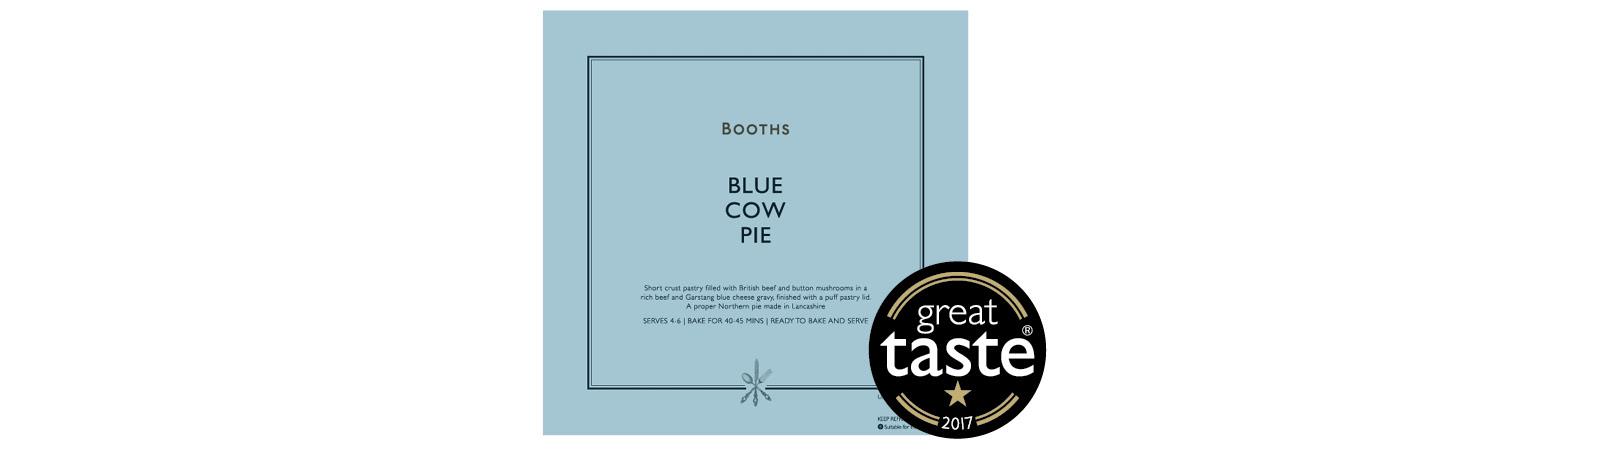 Blue Cow Pie